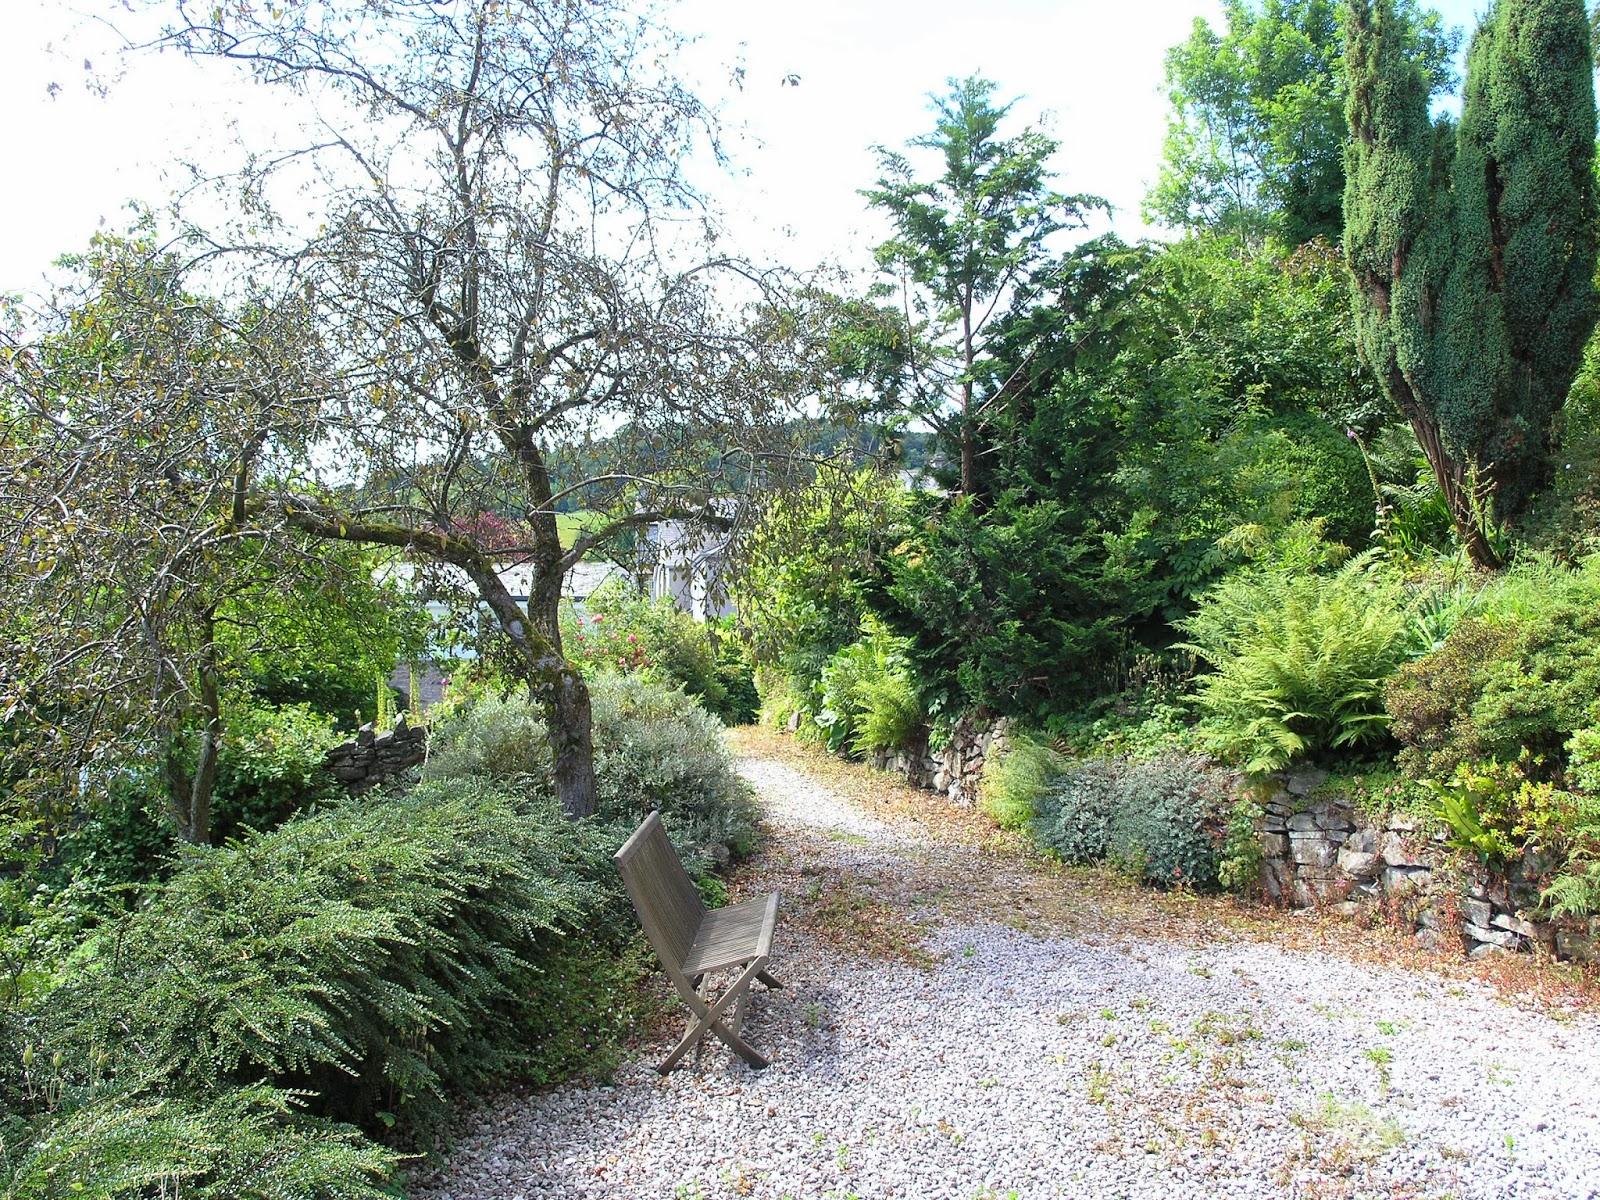 Garden Design Kendal david keegans garden design blog: new garden design project in